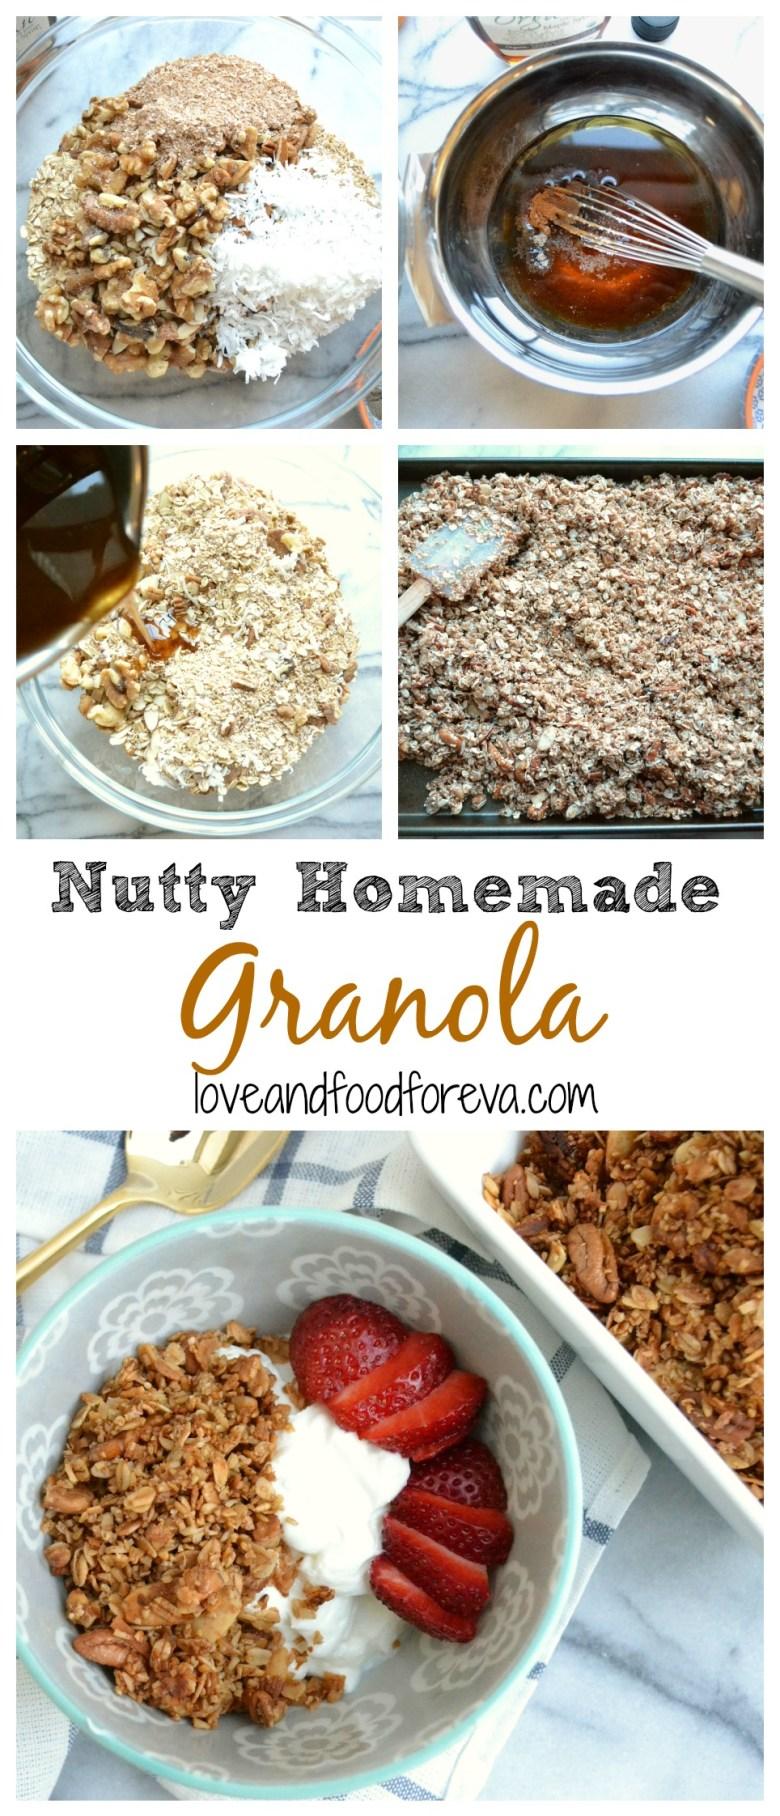 Nutty Homemade Granola - perfect for breakfast, snacks, or dessert!